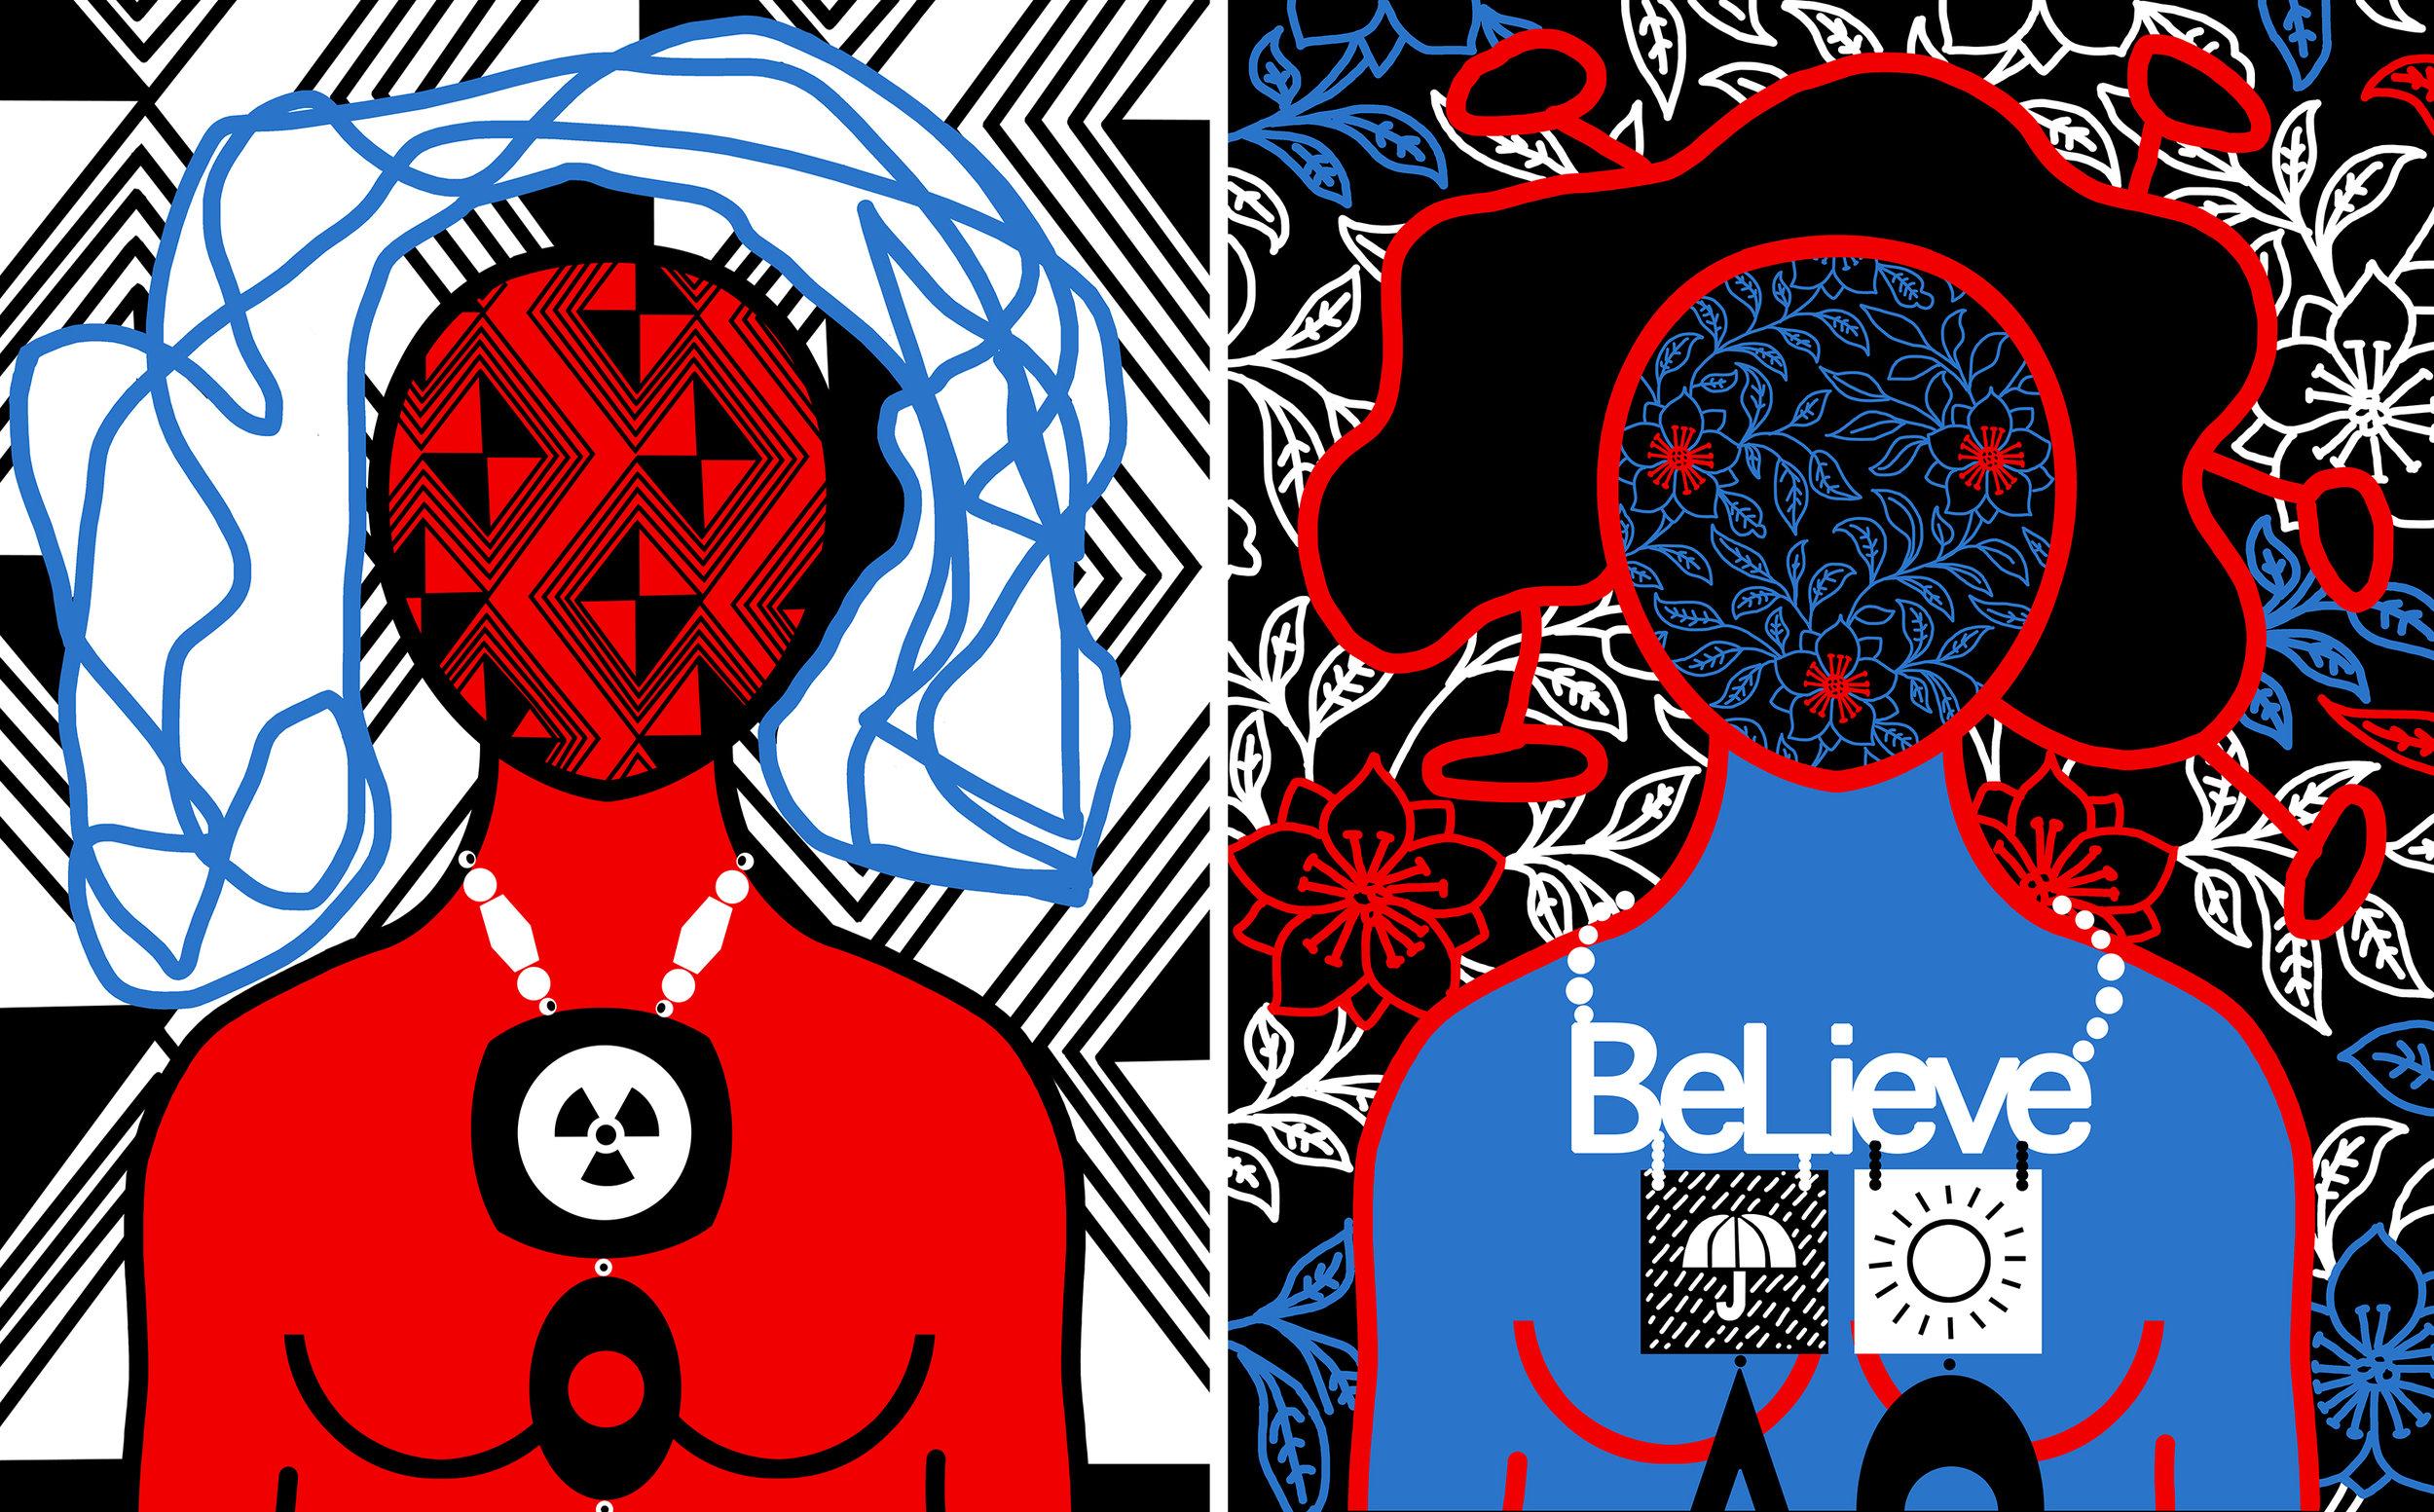 "Printed on fine art paper 20"" x 16"" Be careful radio activity,  20"" x 16"" Believe"